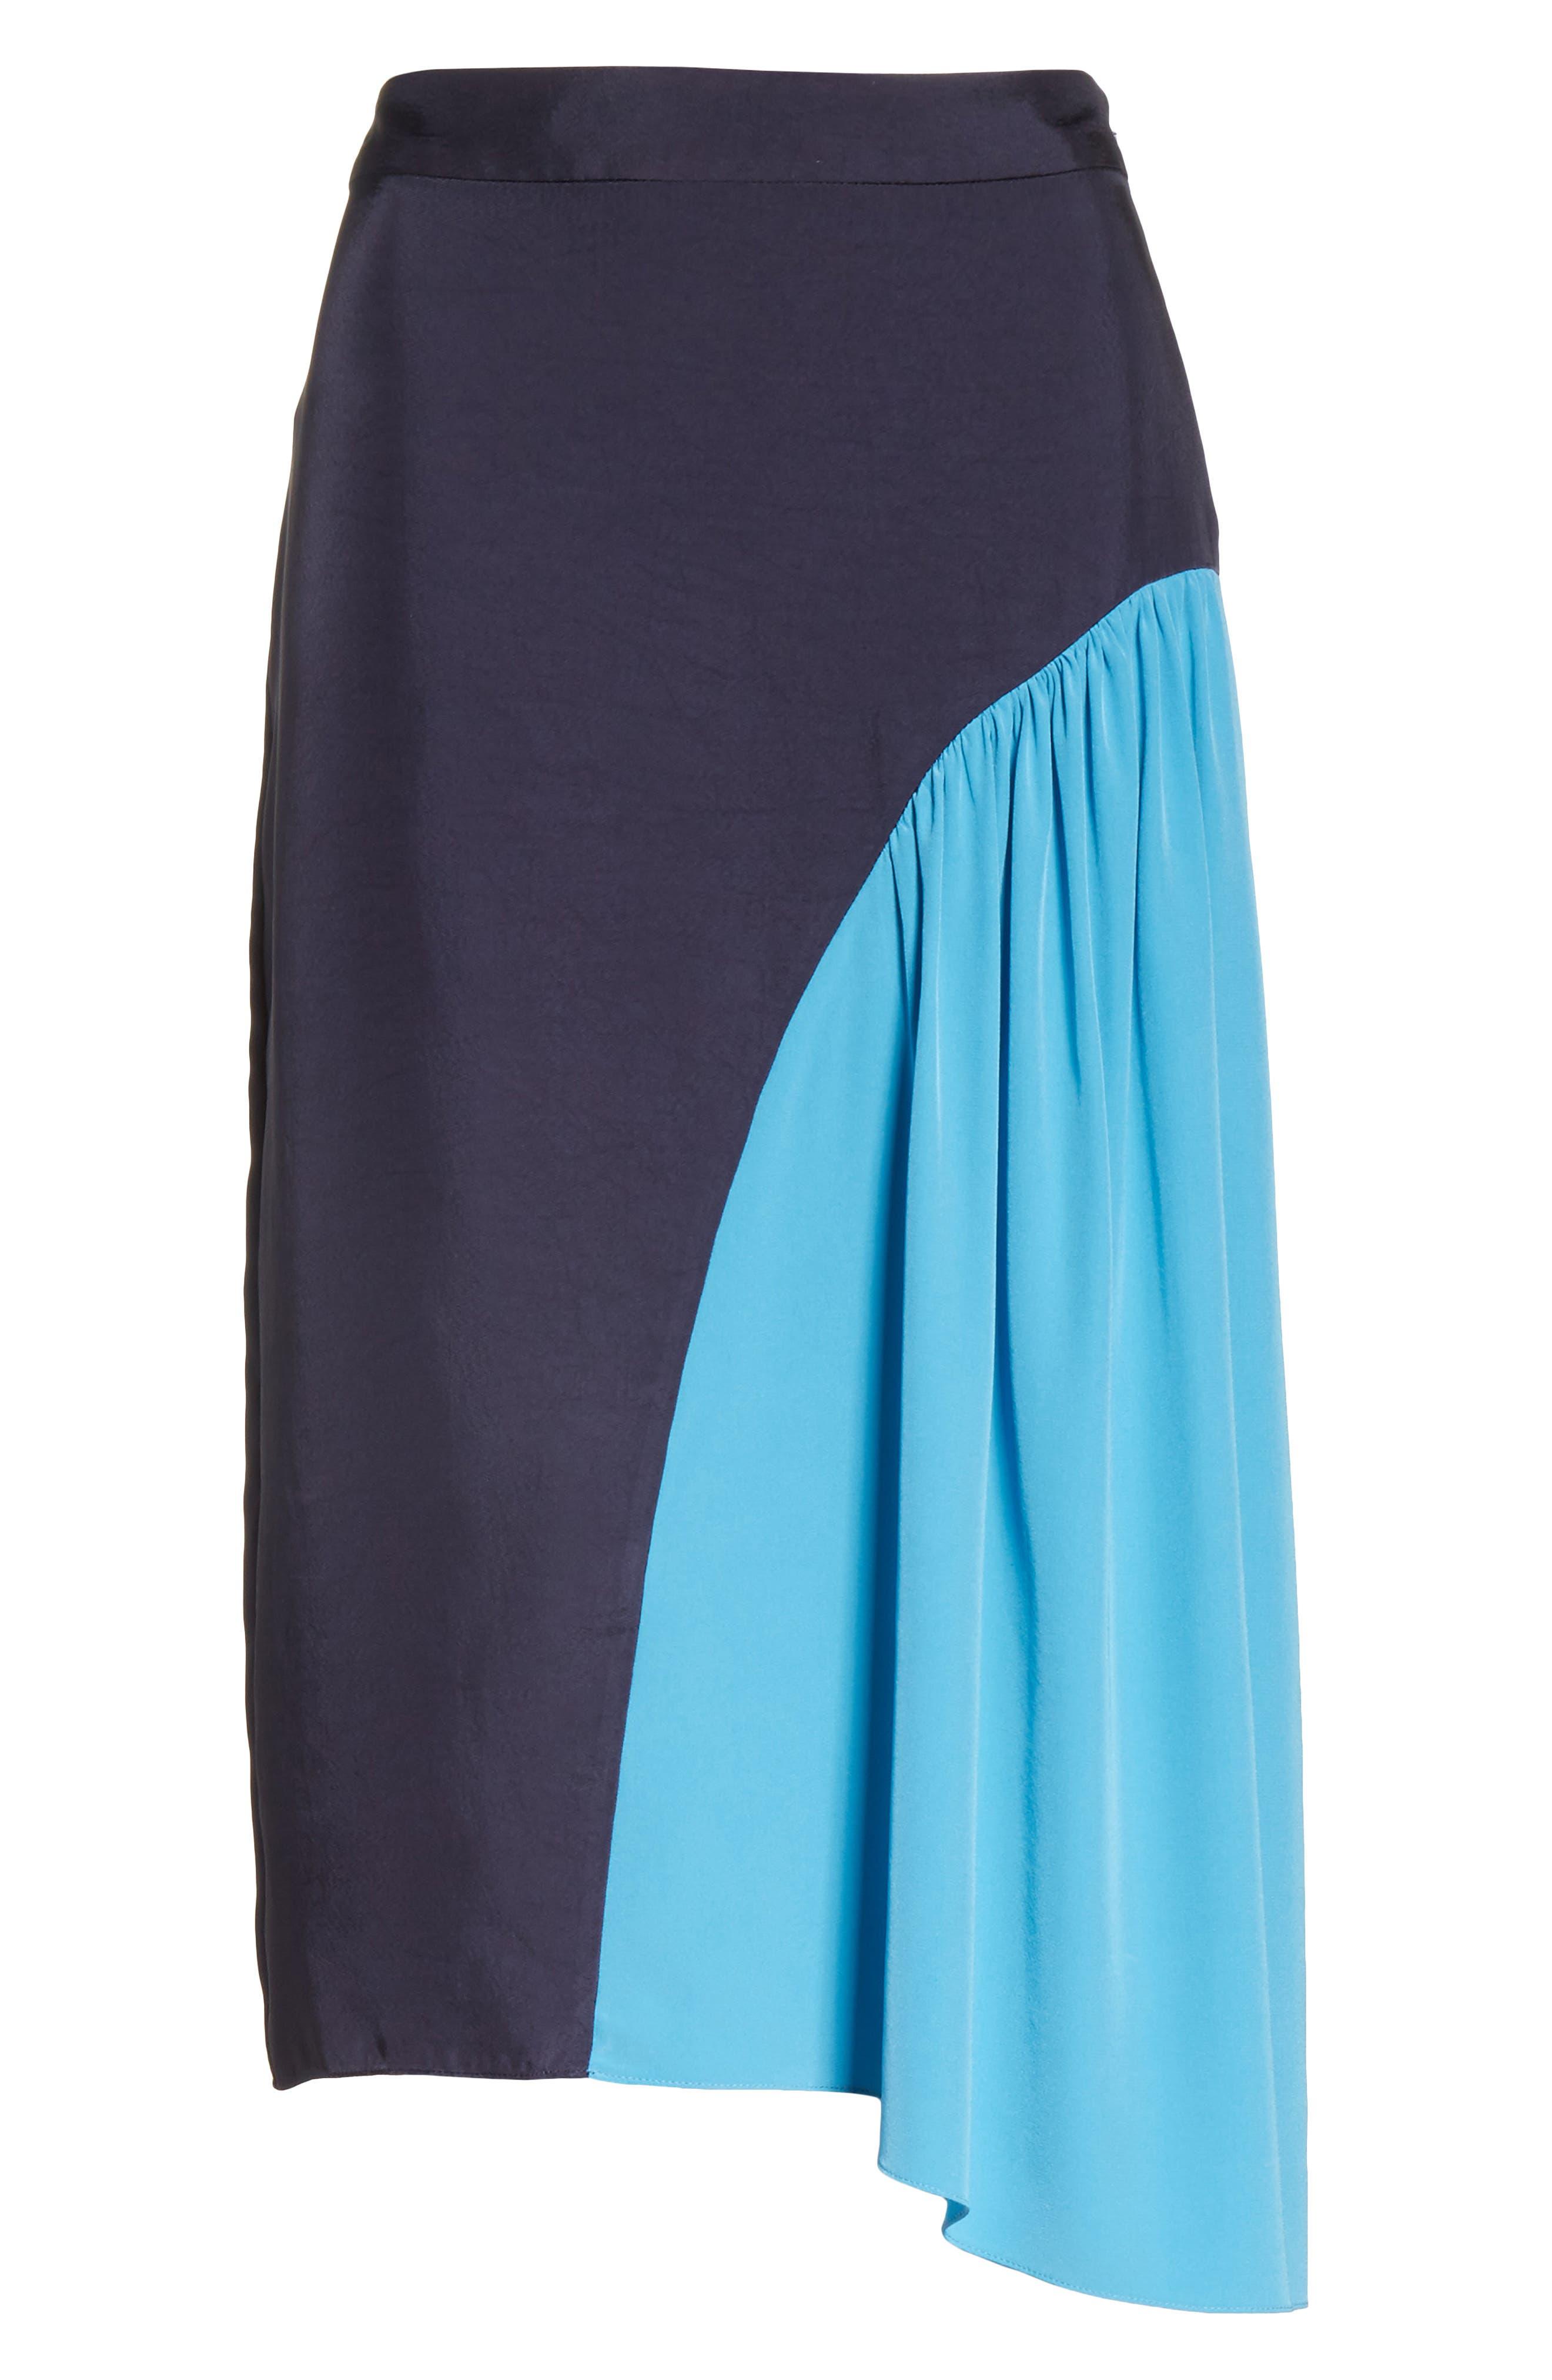 Colorblock Skirt,                             Alternate thumbnail 6, color,                             Navy/ Blue Multi